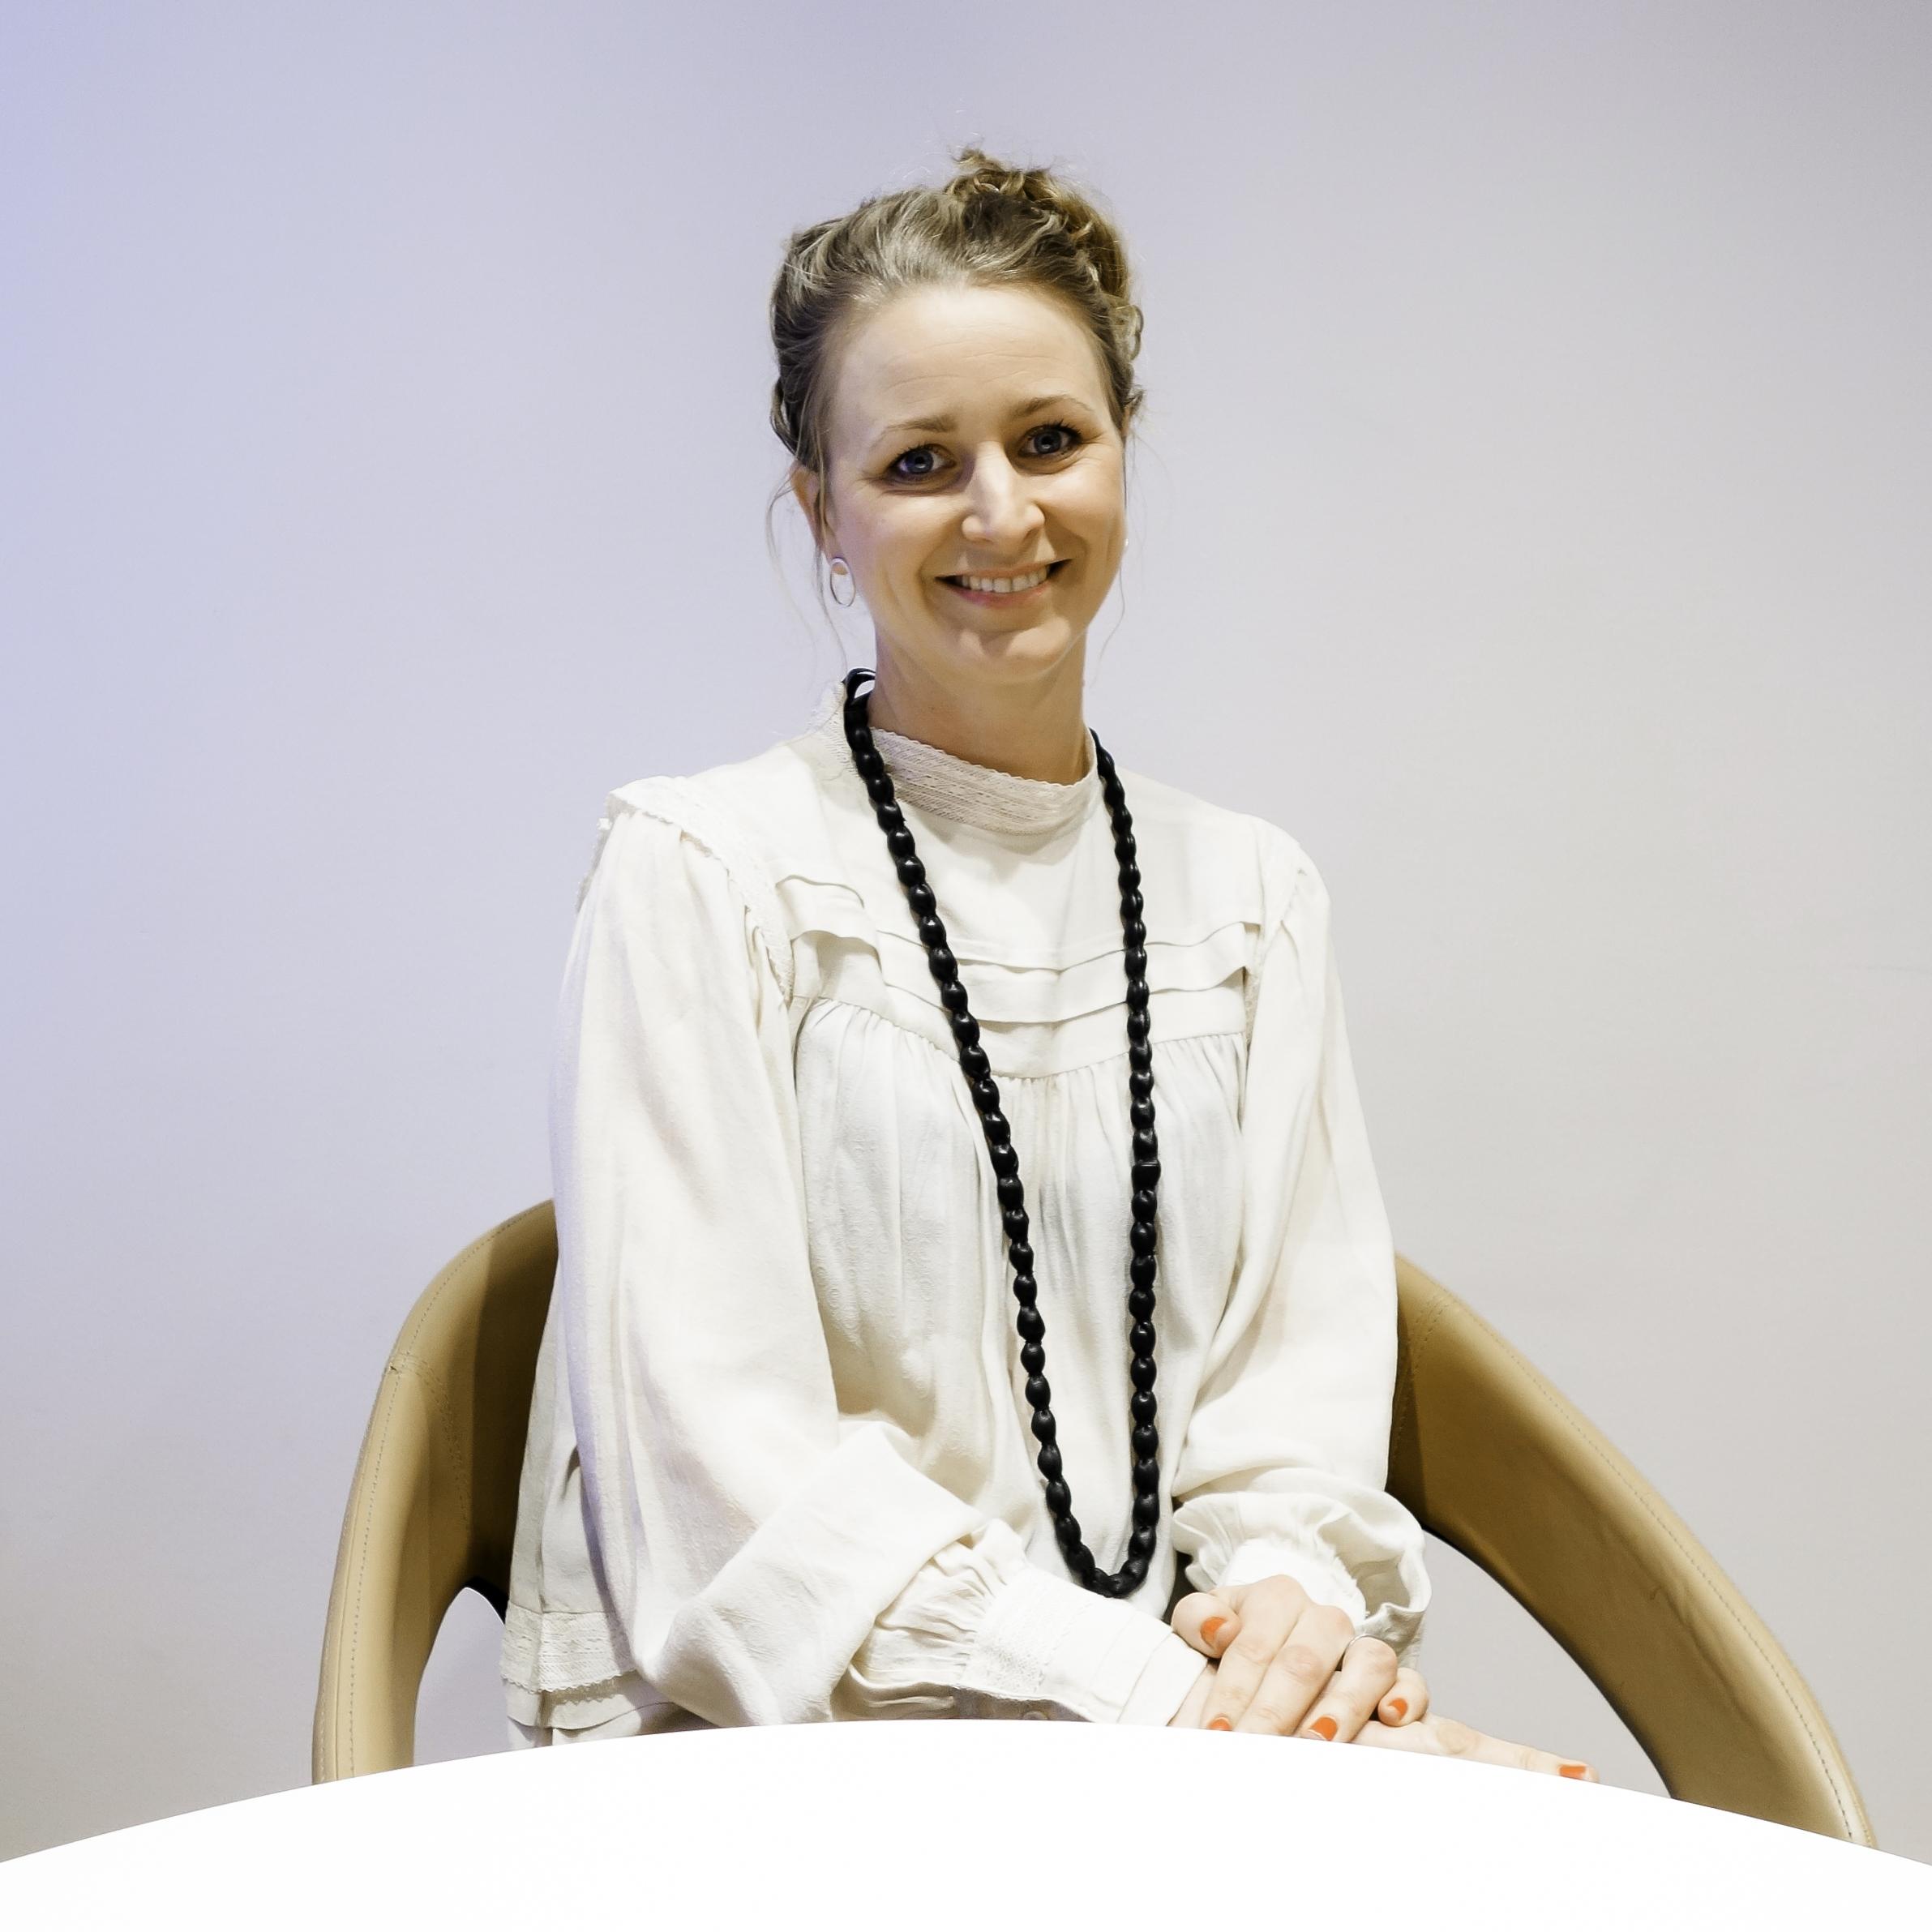 Sofia Lindhagen   Arkitekt  sofia.lindhagen@elindersten.se +46(0)72-504 73 18